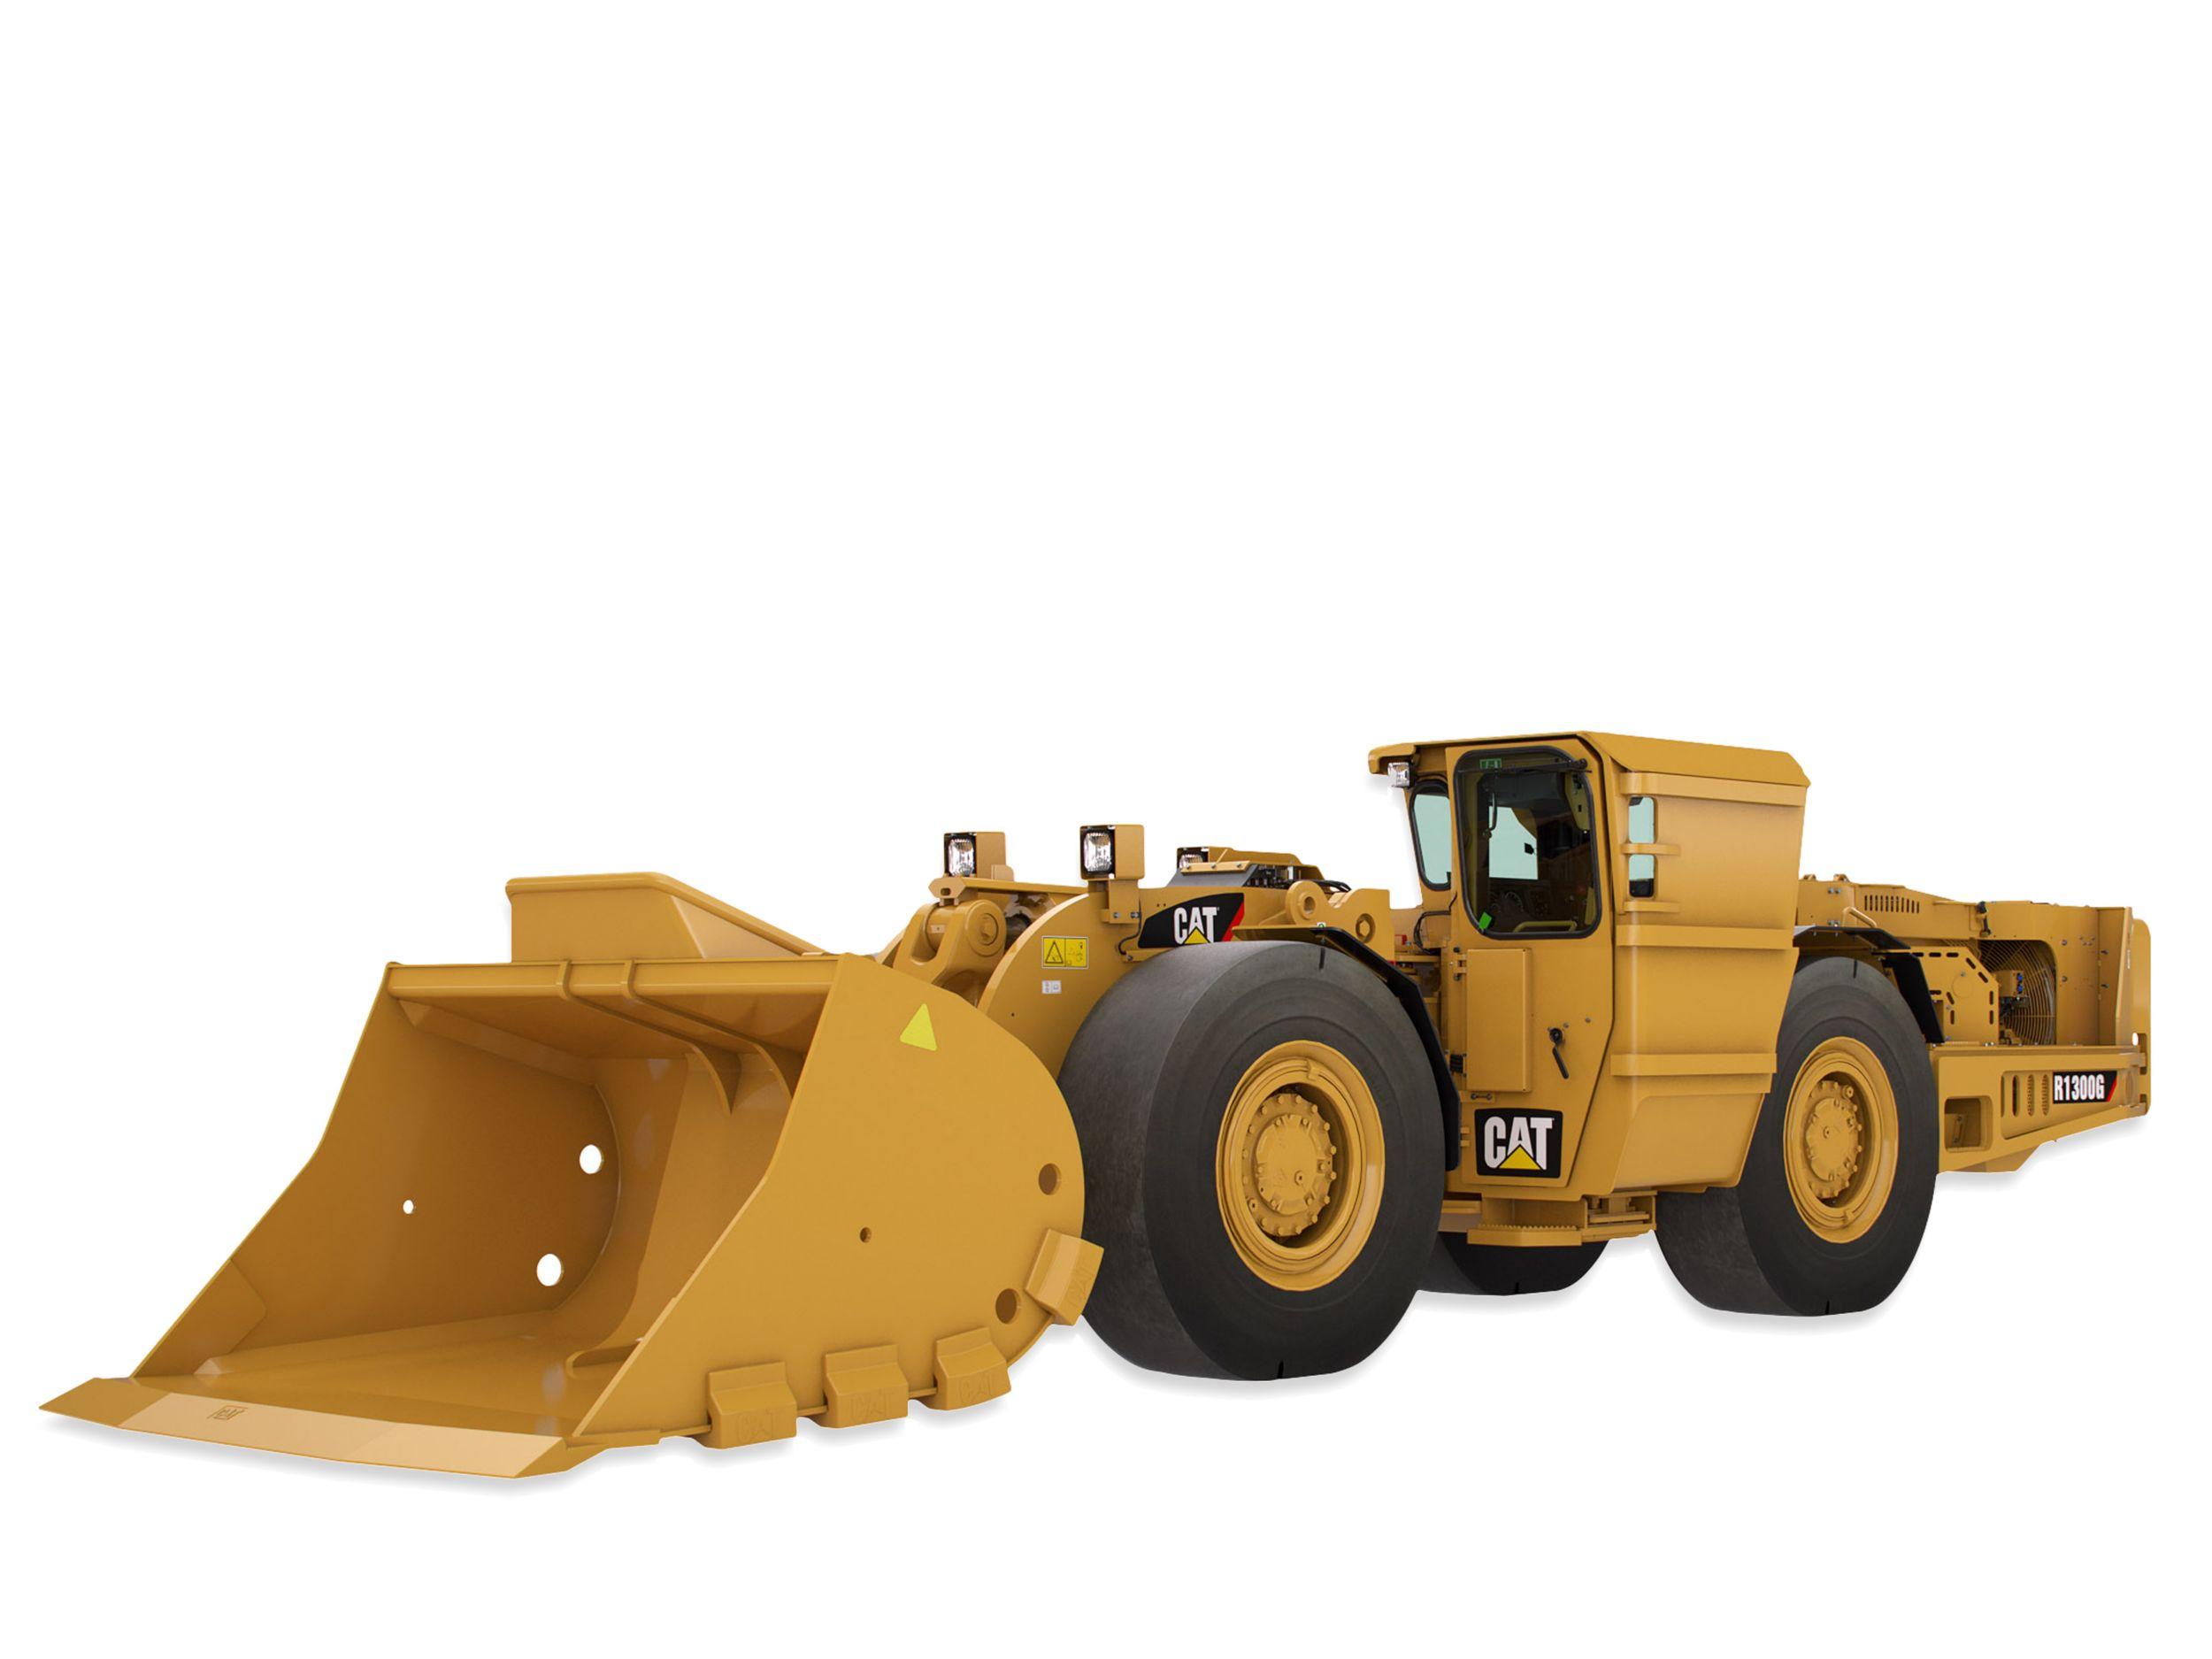 Underground Mining Load-Haul-Dump (LHD) Loaders